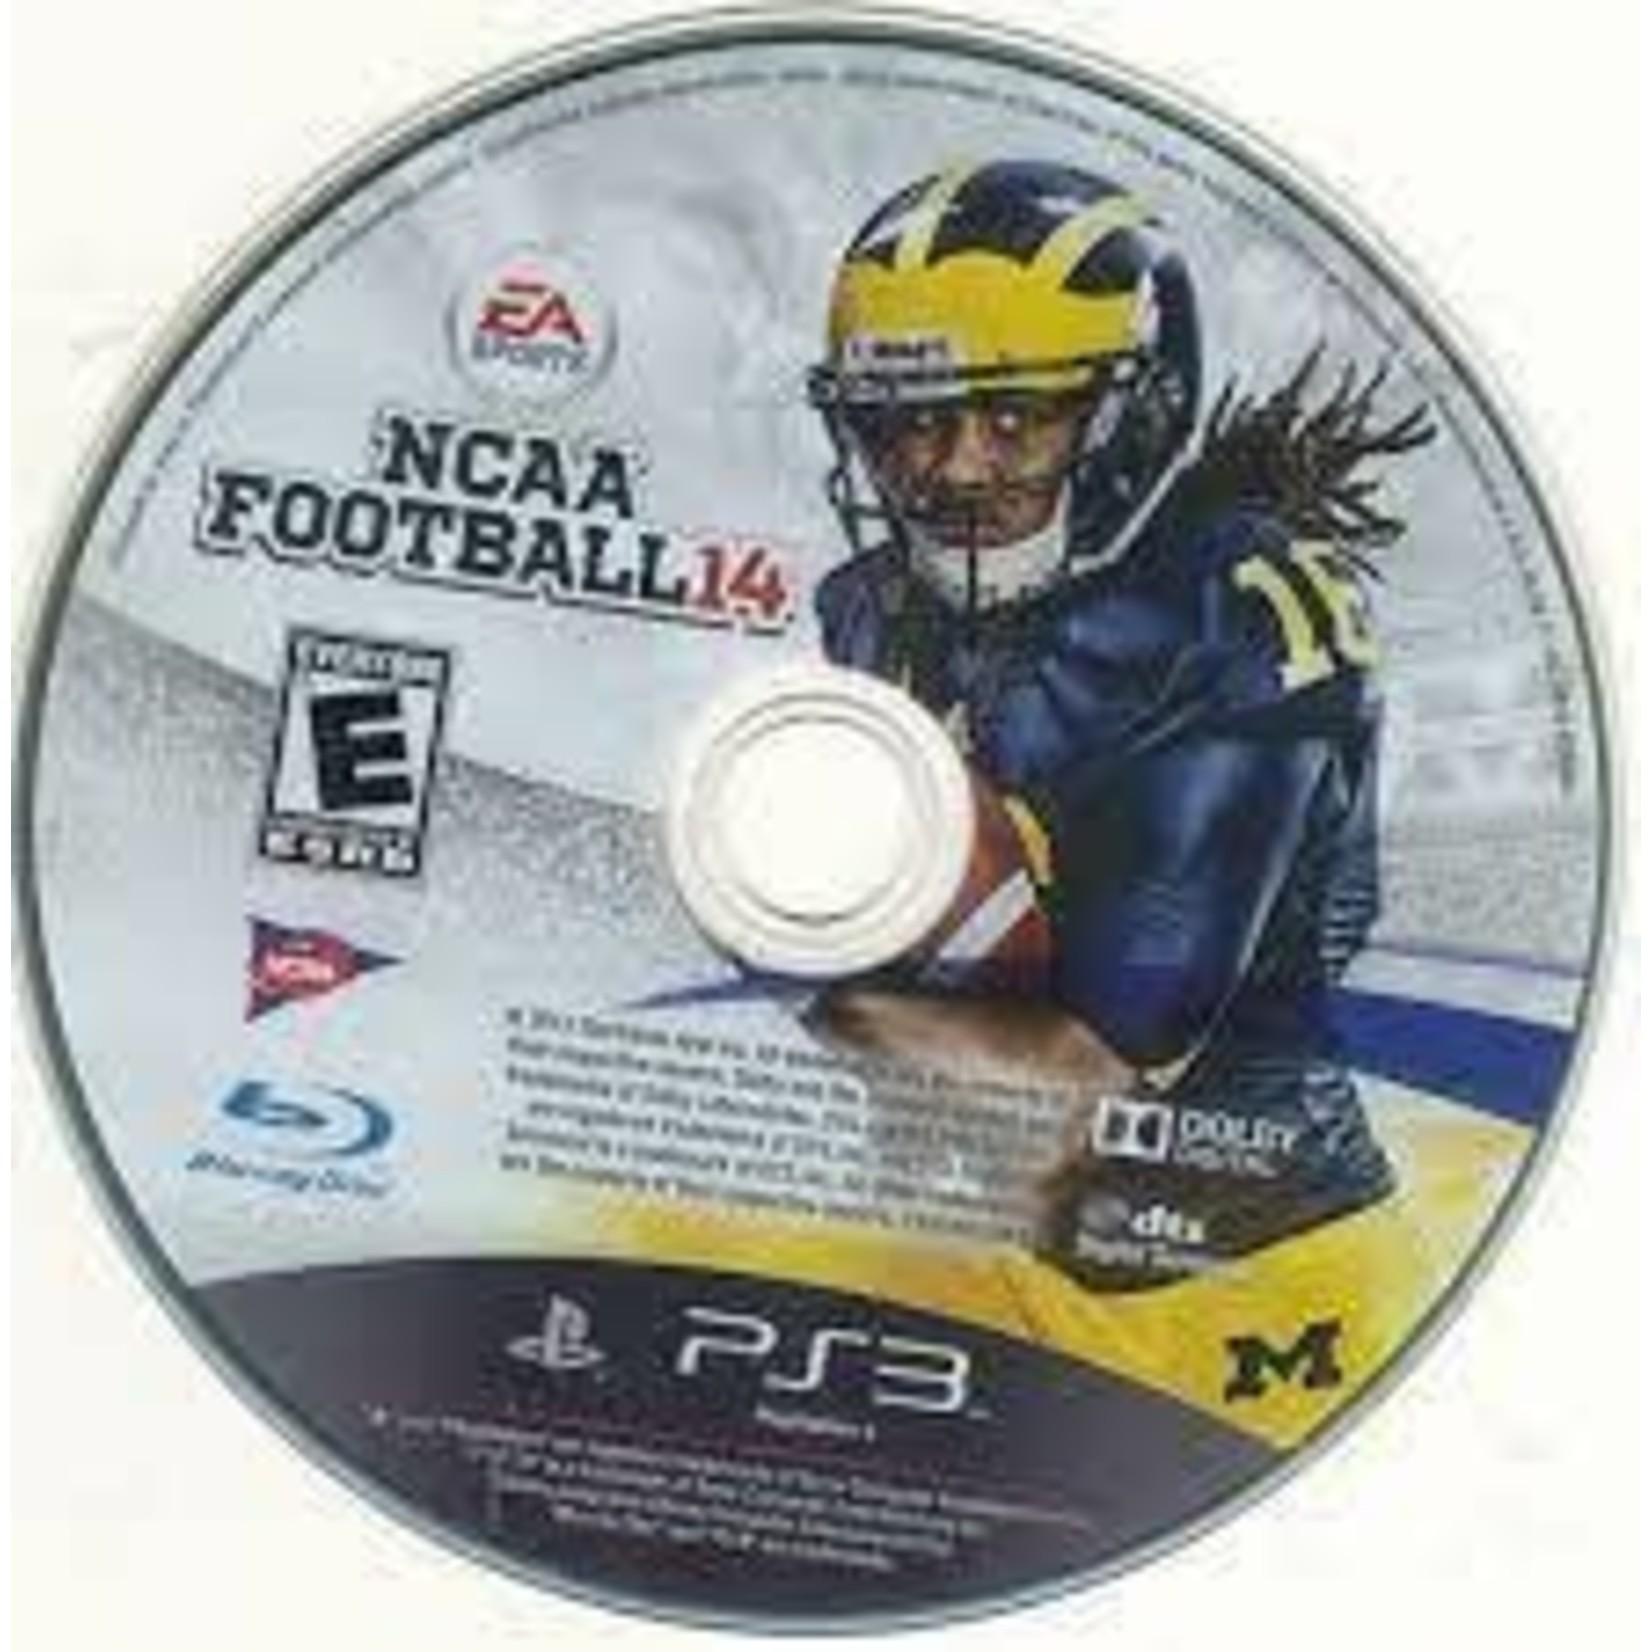 PS3U-NCAA Football 14 (Disc Only)